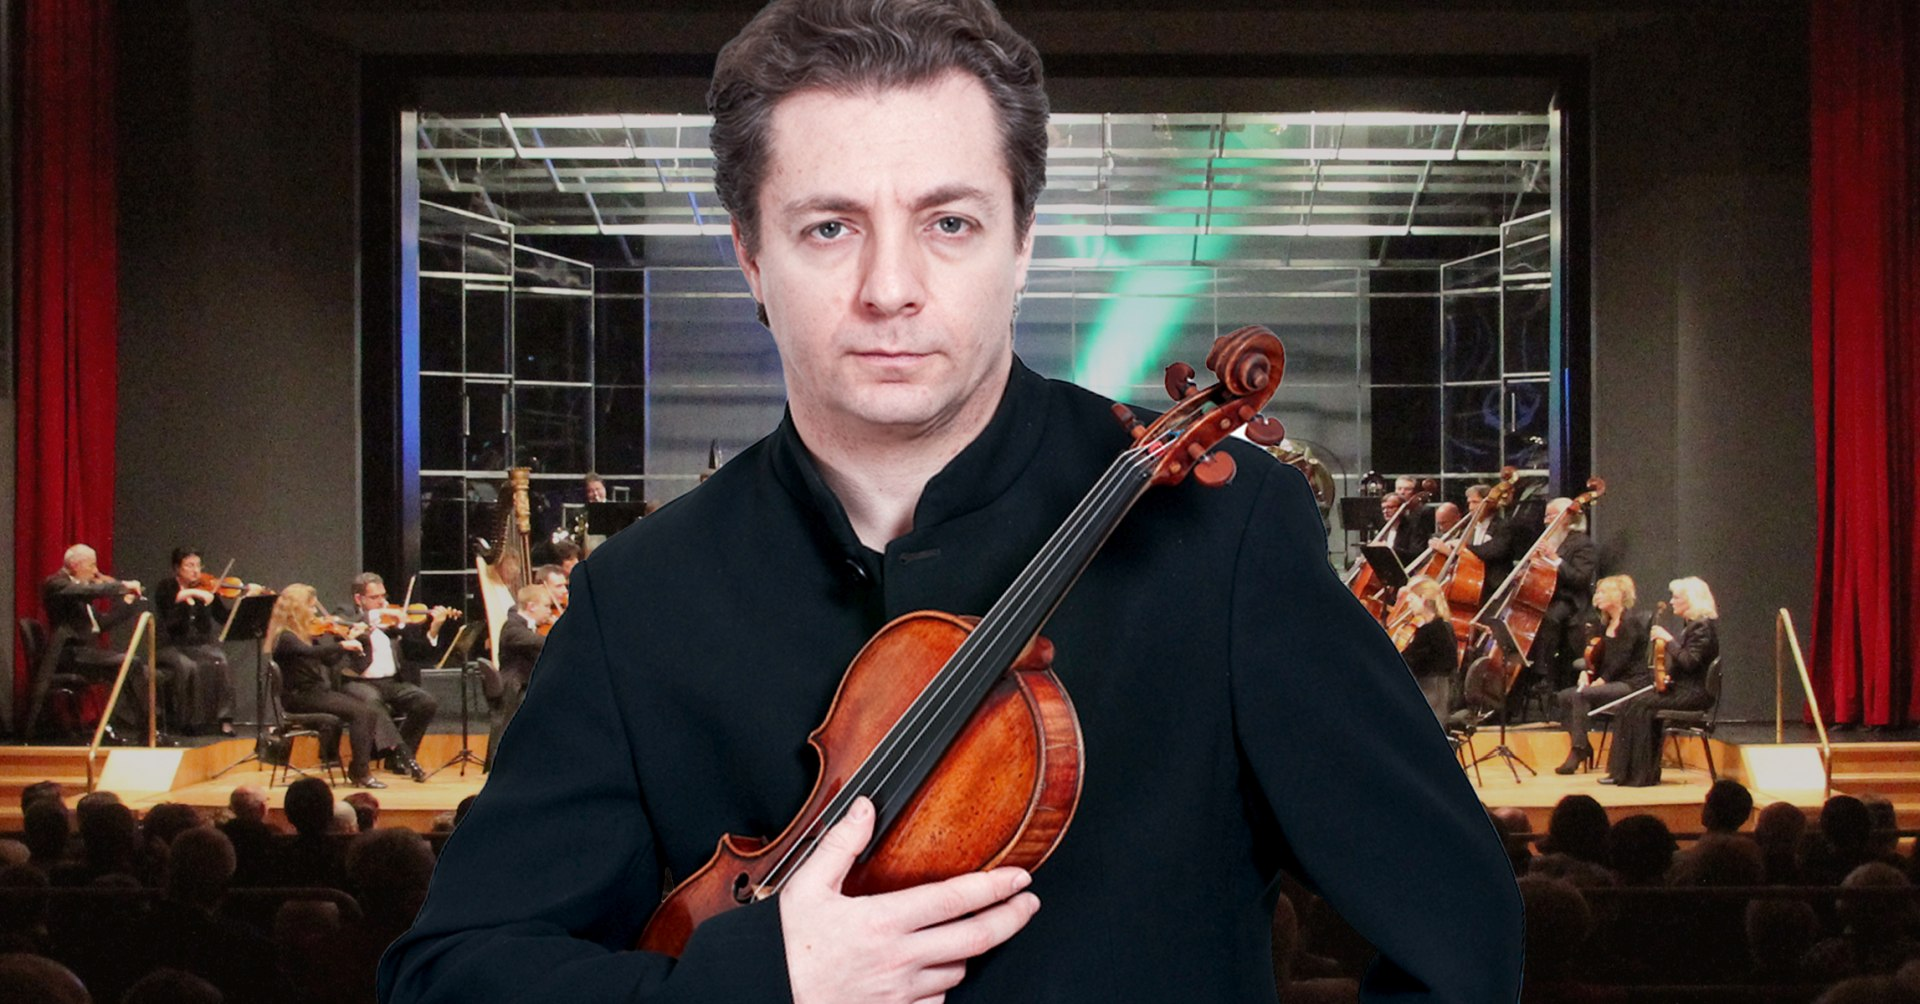 Pavel Bermann